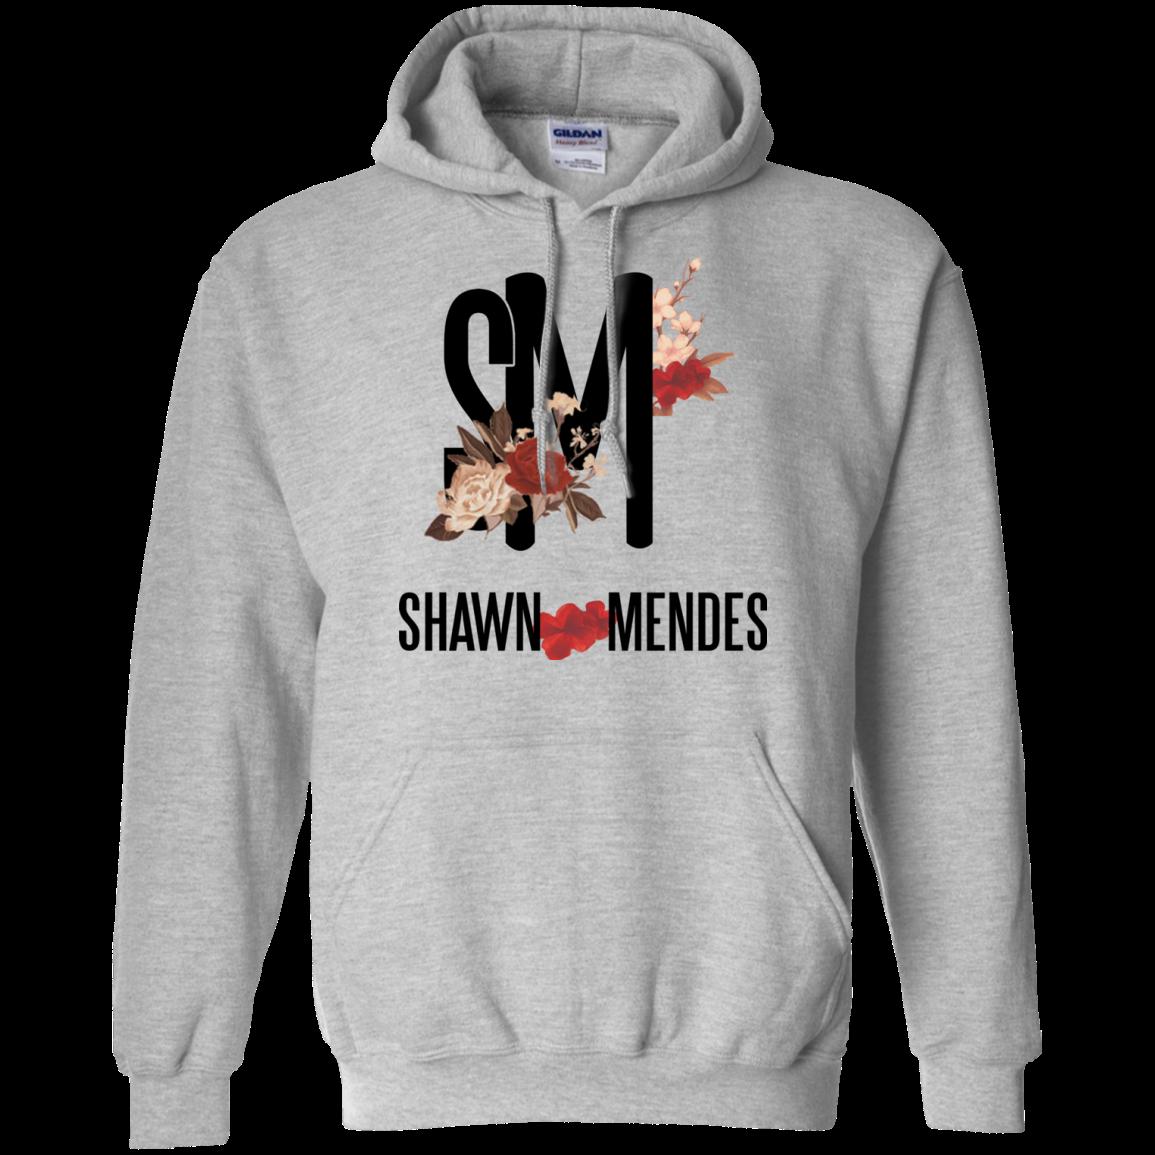 Floral Shawn Mendes G185 Gildan Pullover Hoodie 8 oz. Men